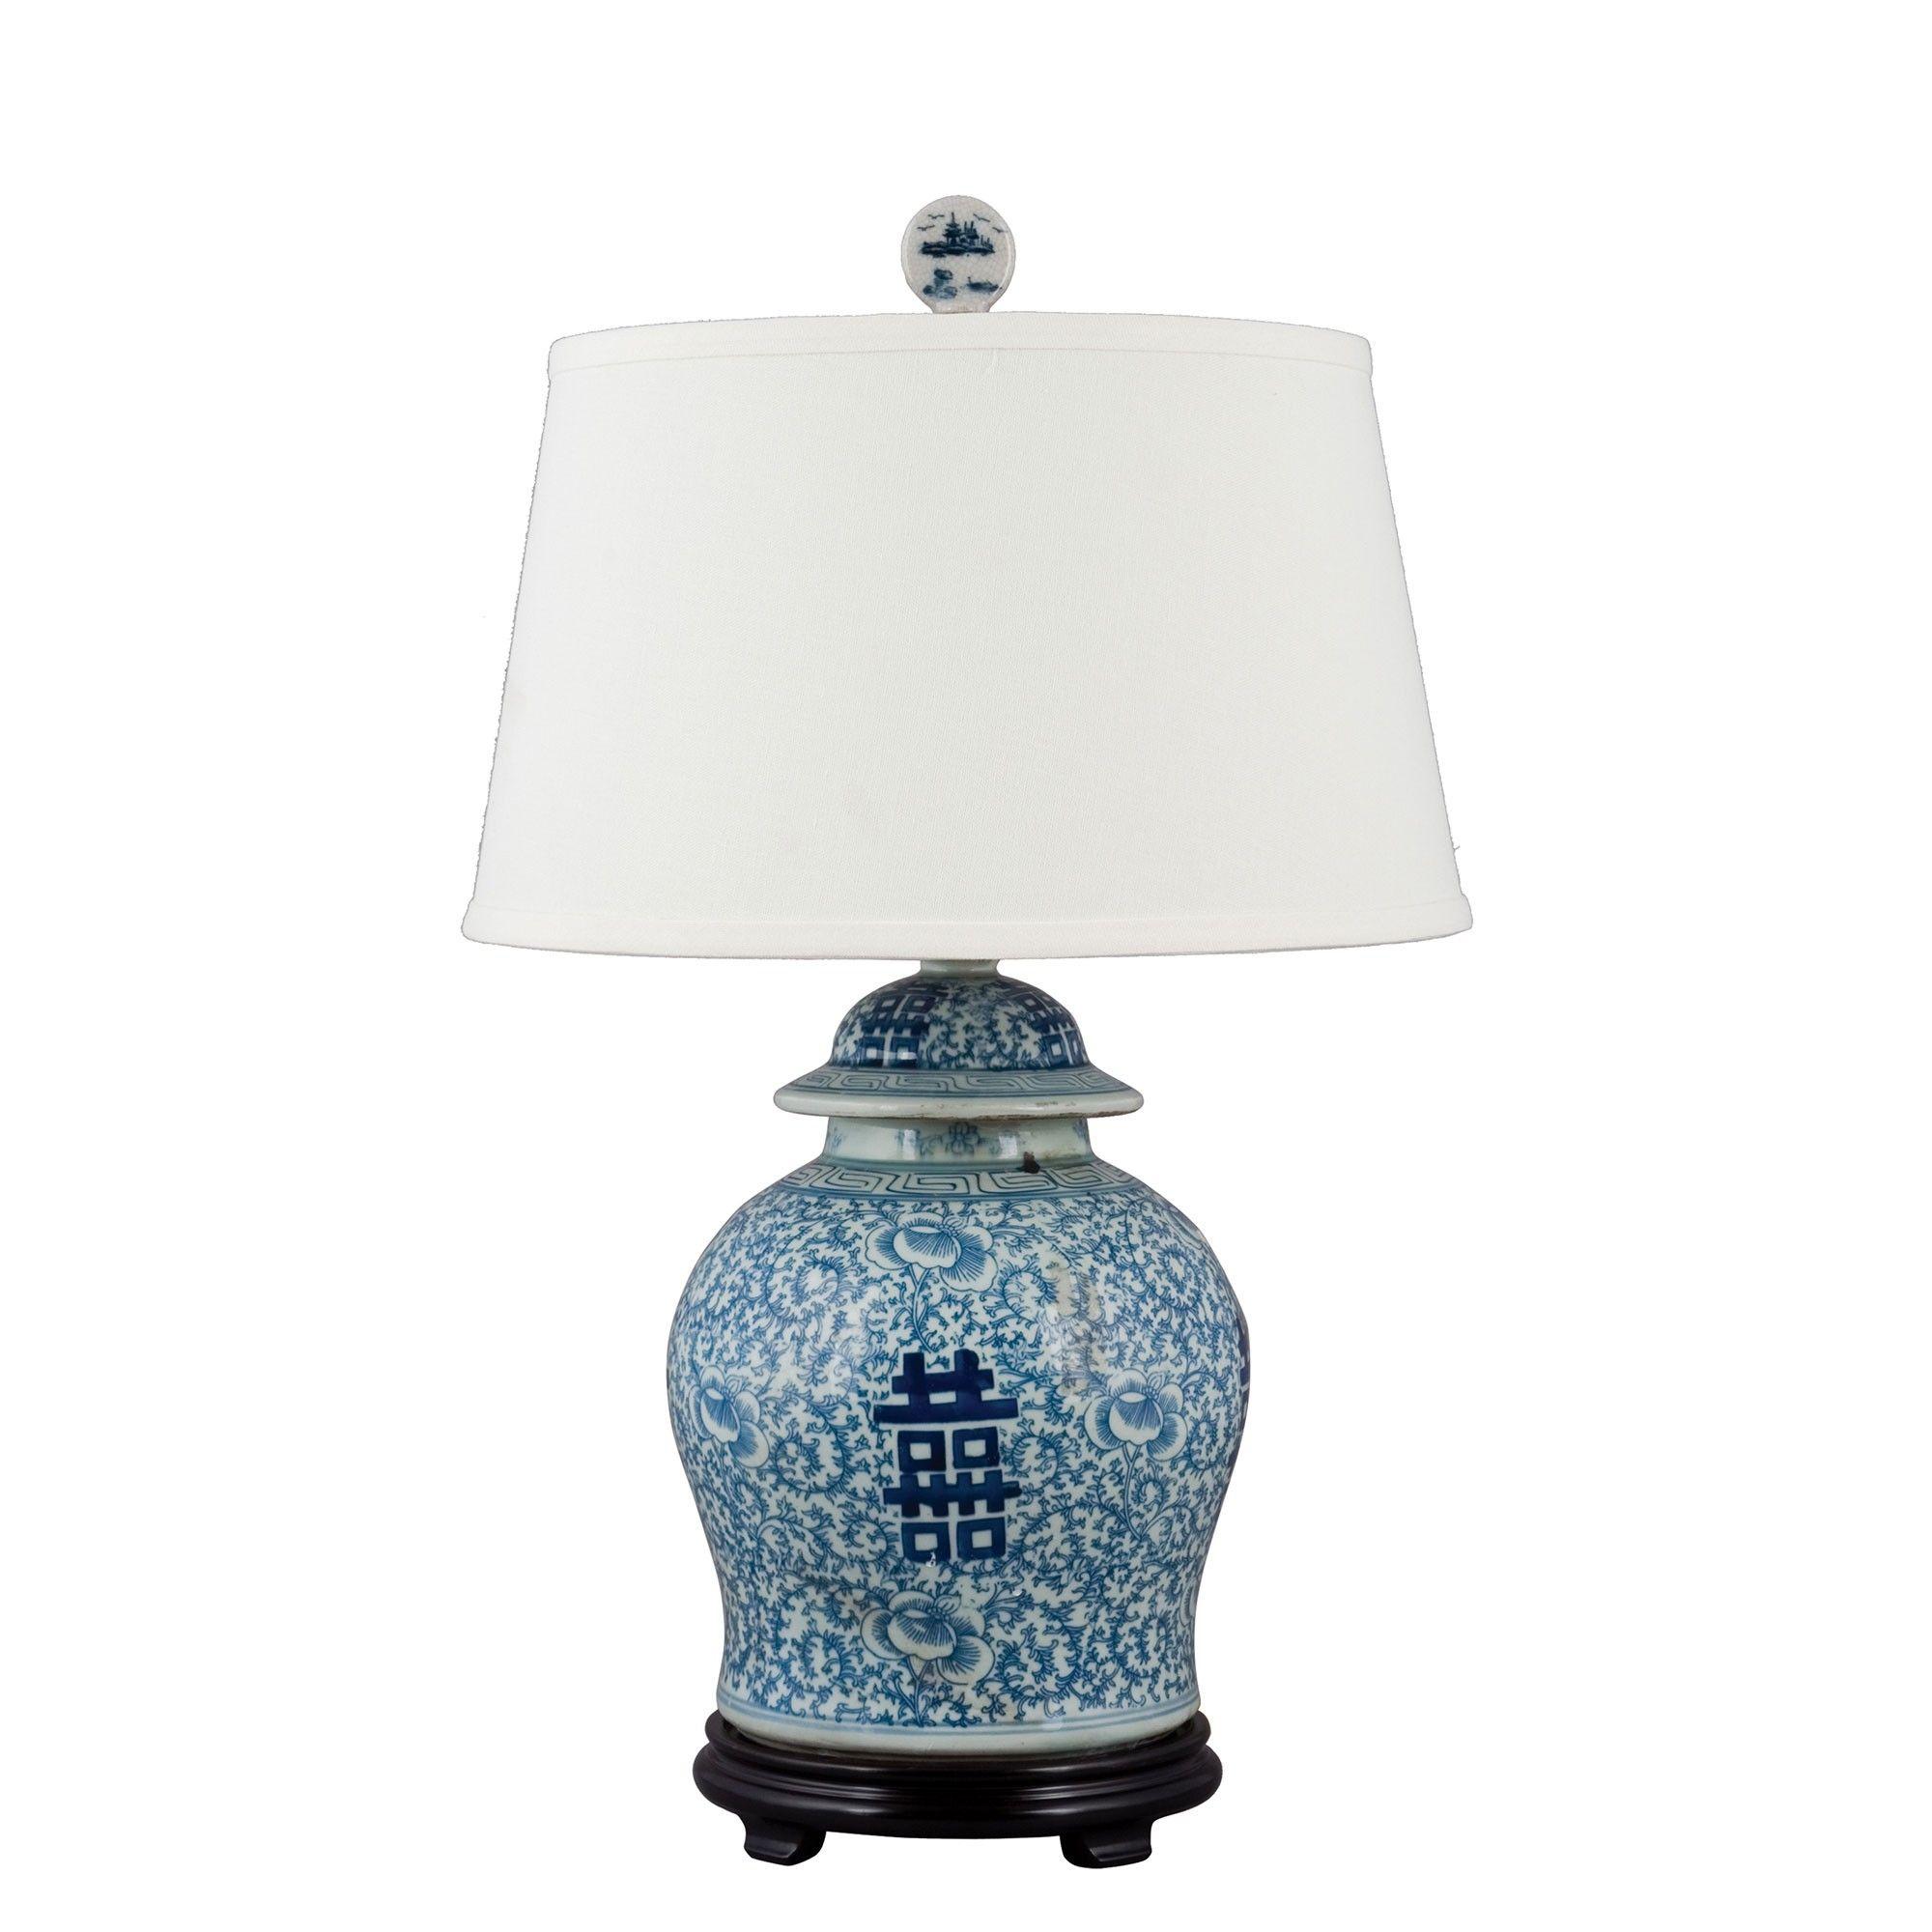 Double Happiness Ginger Jar Lamp Porcelain Brass Burl Jar